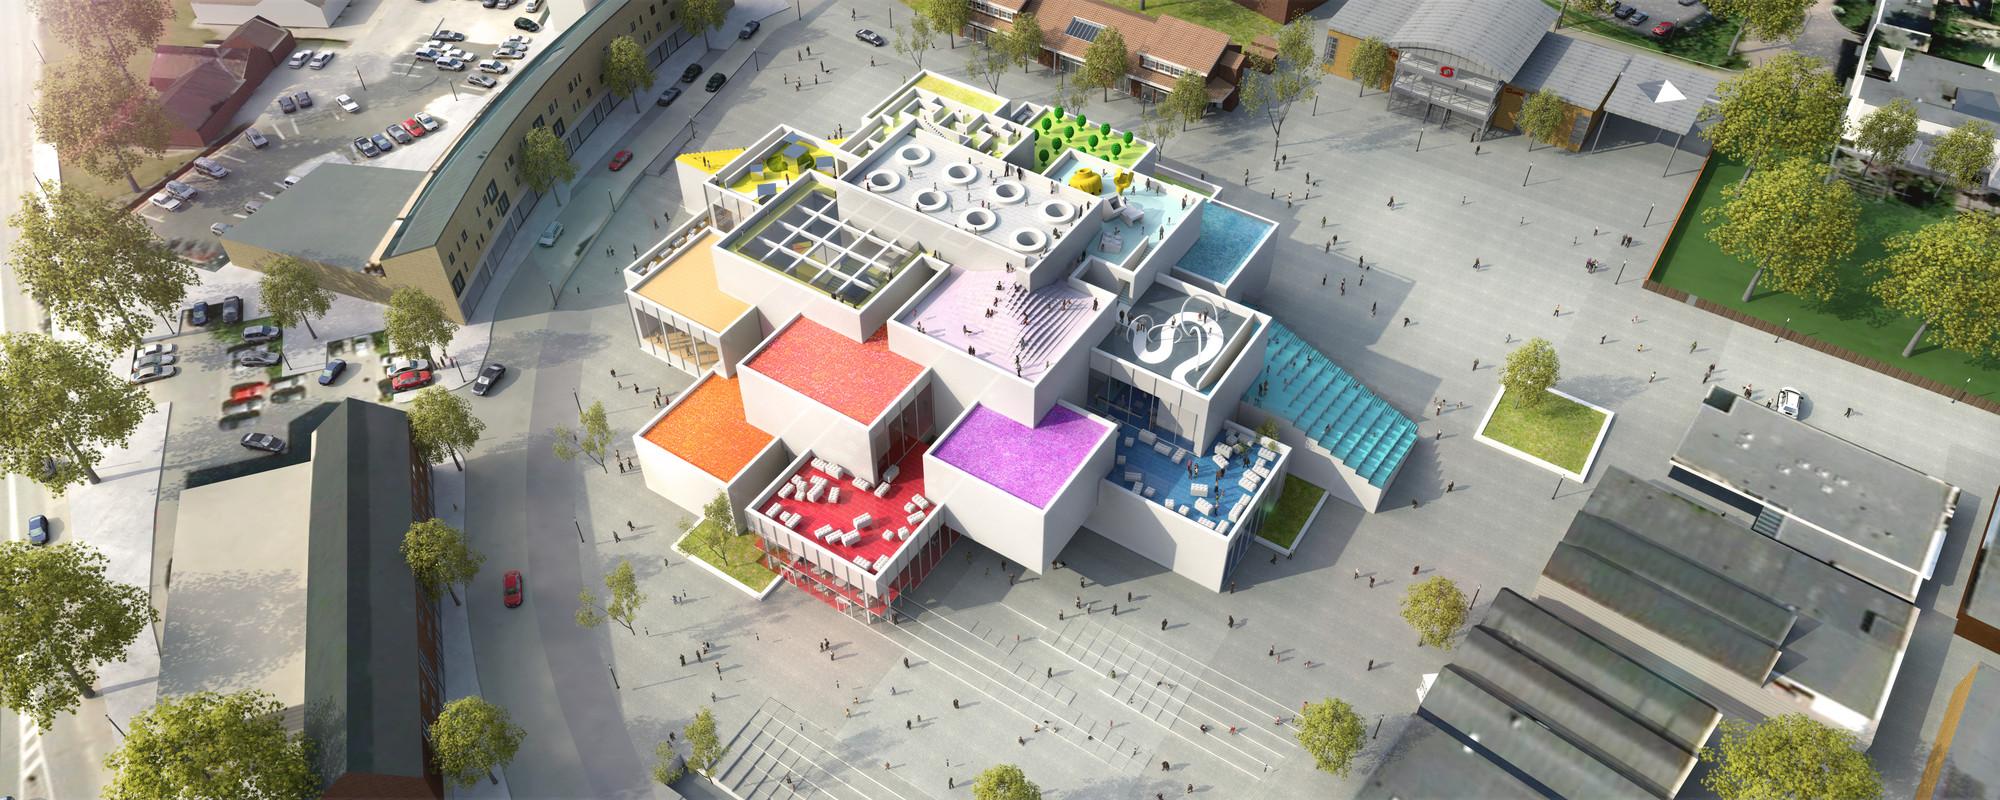 Bjarke Ingels Lays Foundation Brick At Lego House Archdaily